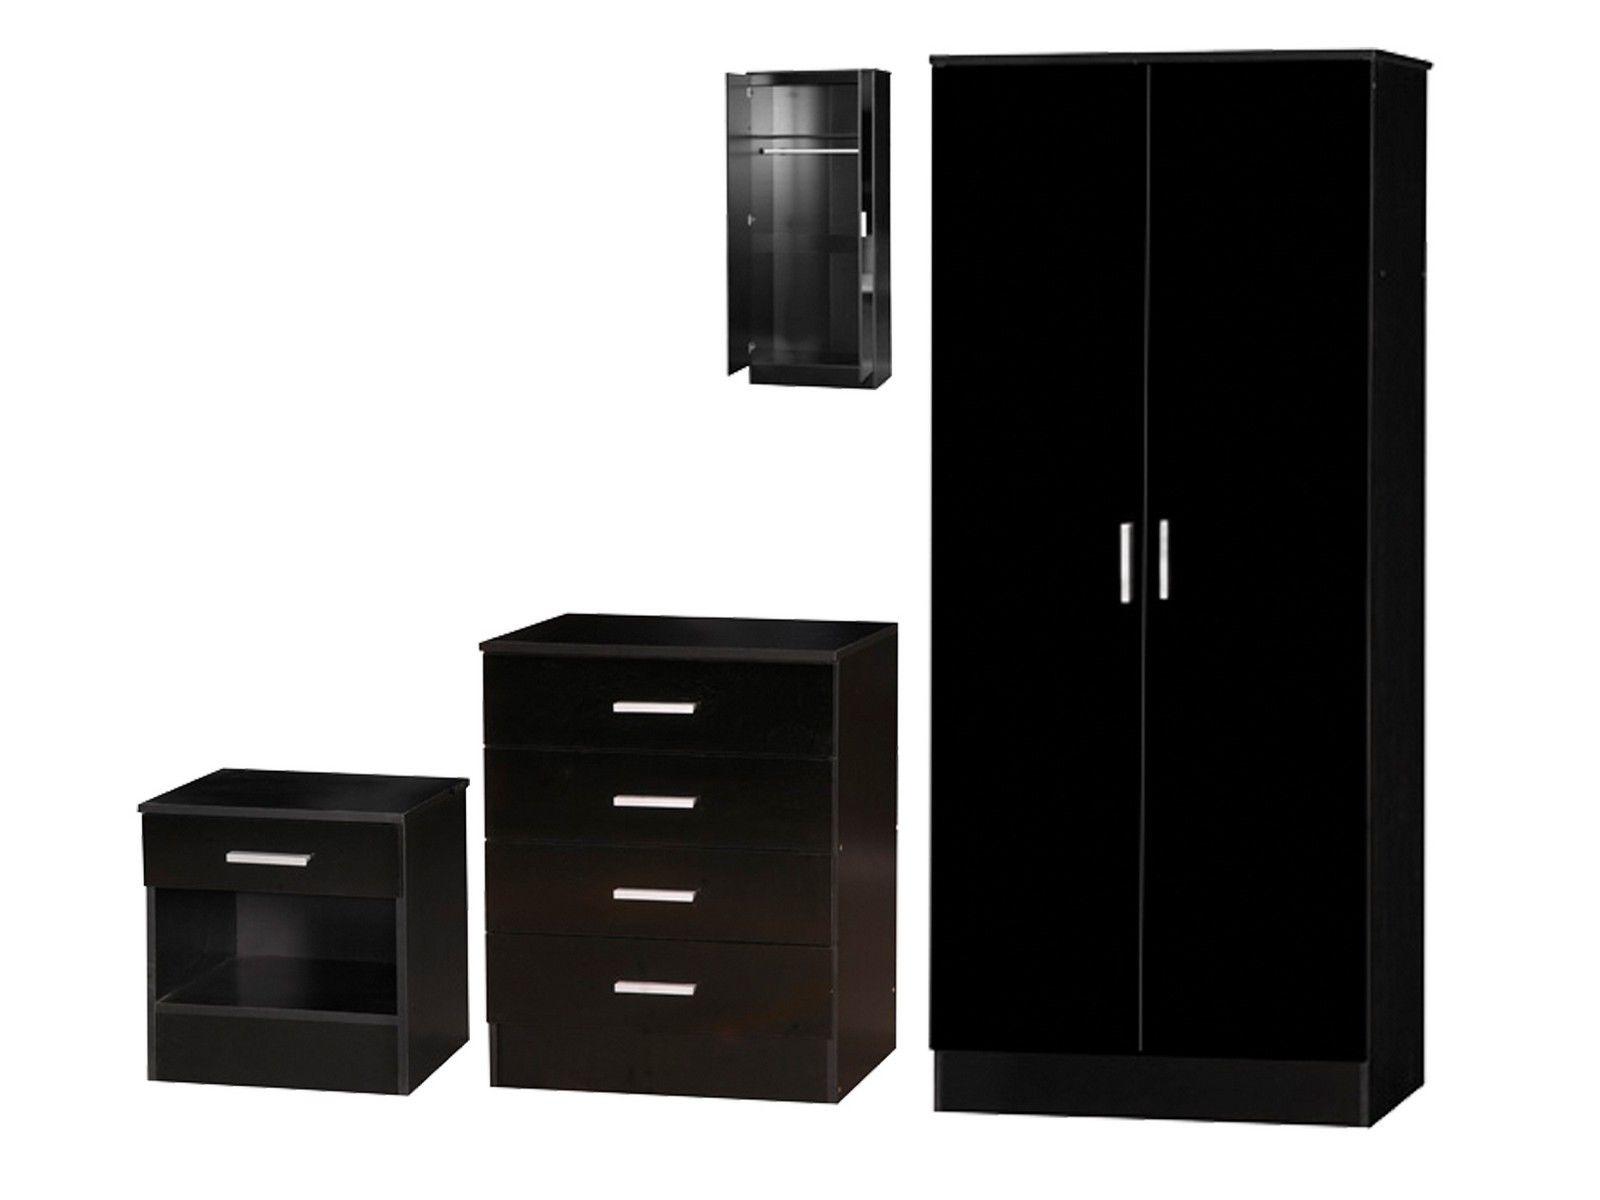 Galaxy gloss bedroom set wardrobe chest of drawers - Black chest of drawers for bedroom ...